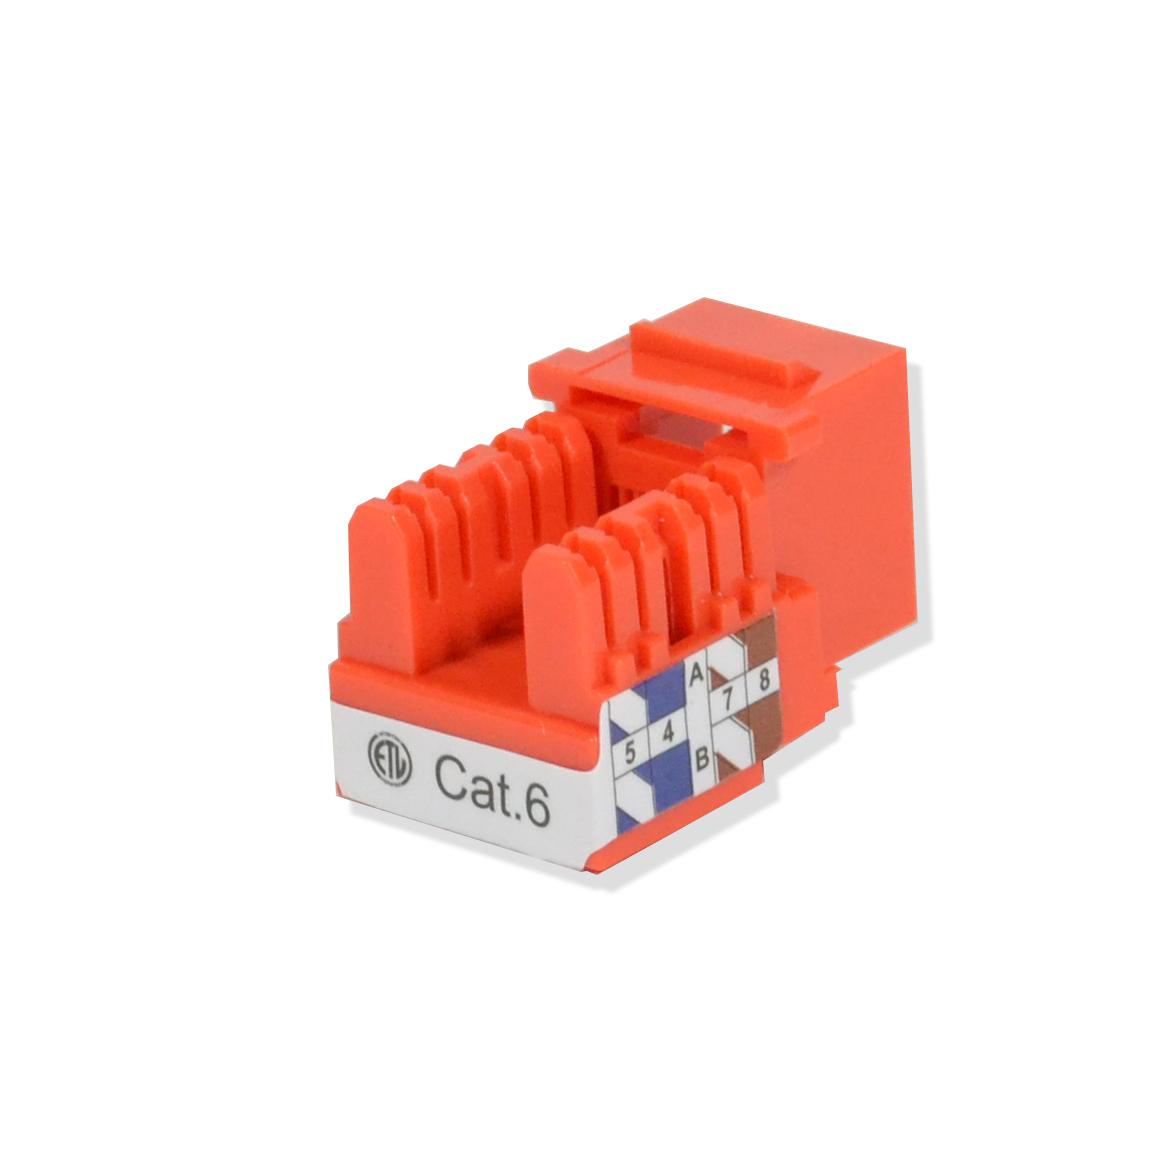 Cat6 Keystone Jack 110 Punch Down Network Ethernet Rj45